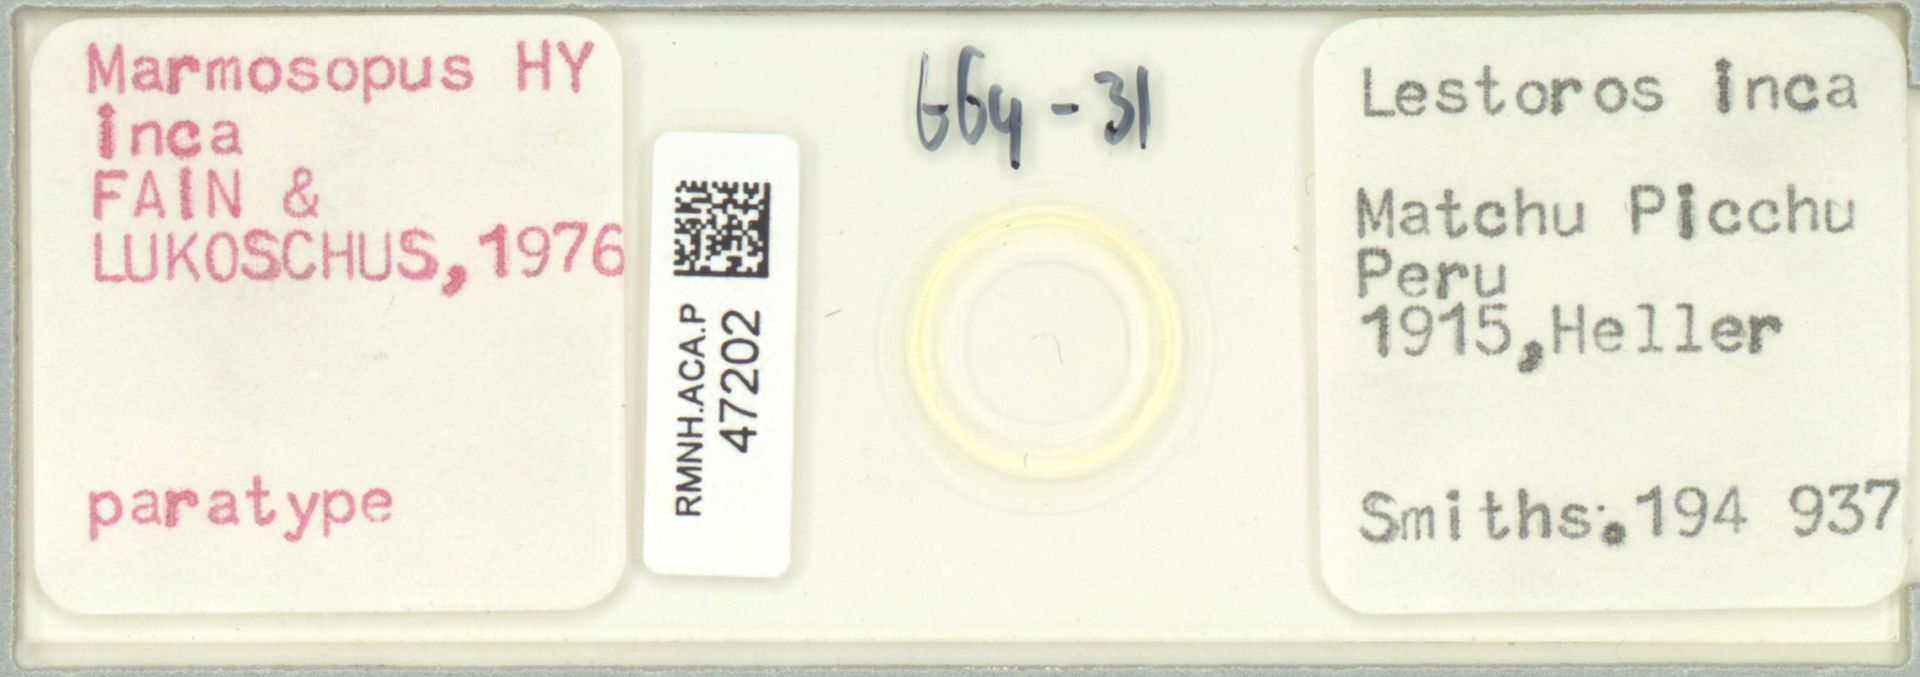 RMNH.ACA.P.47202 | Marmosopus inca FAIN & LUKOSCHUS, 1976